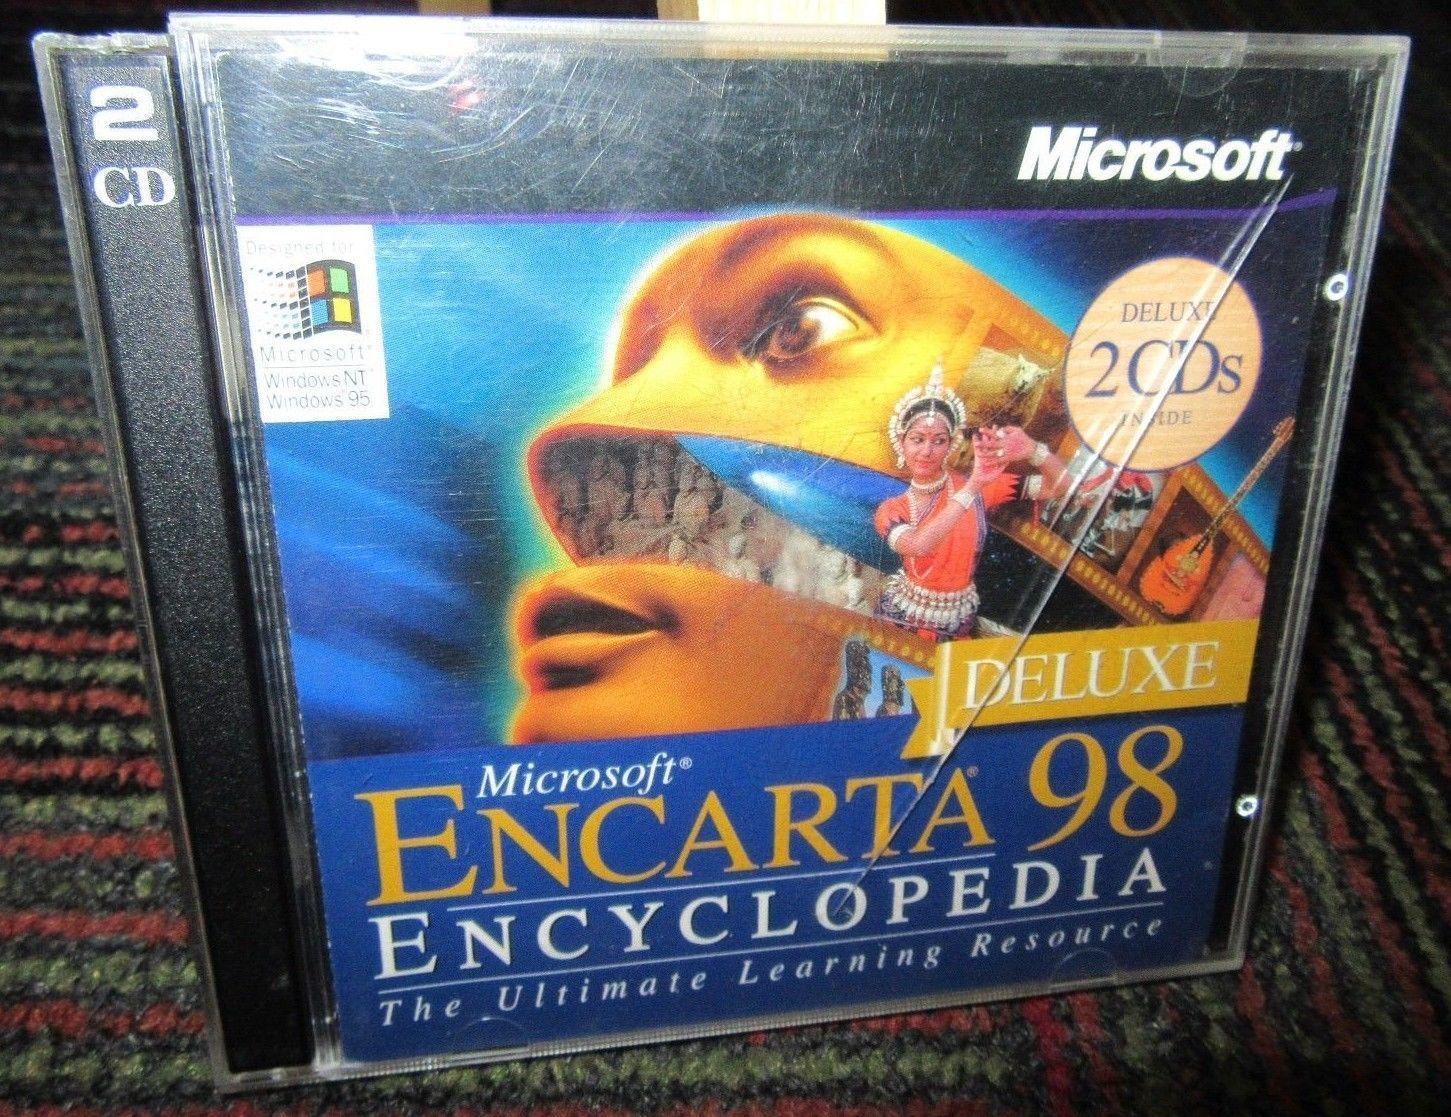 Microsoft encarta 98 deluxe encyclopedia and 50 similar items s l1600 m4hsunfo